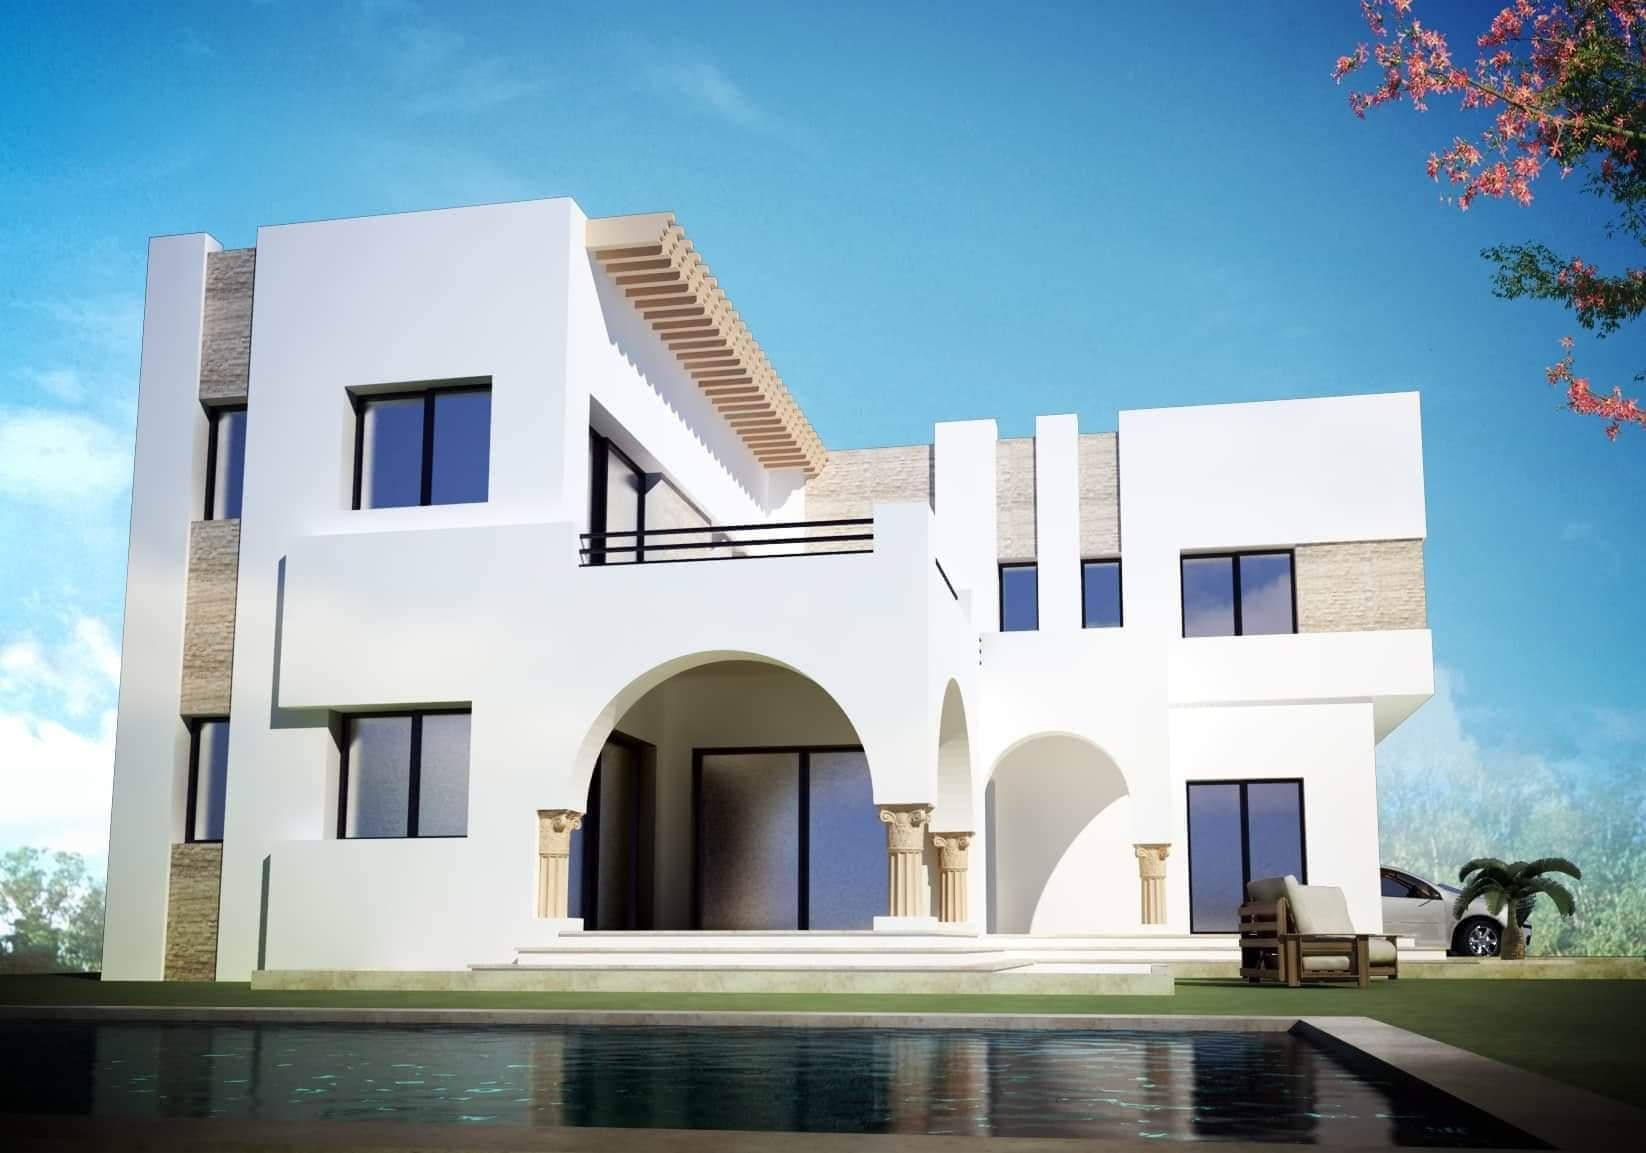 Villa brunella 1 réf: